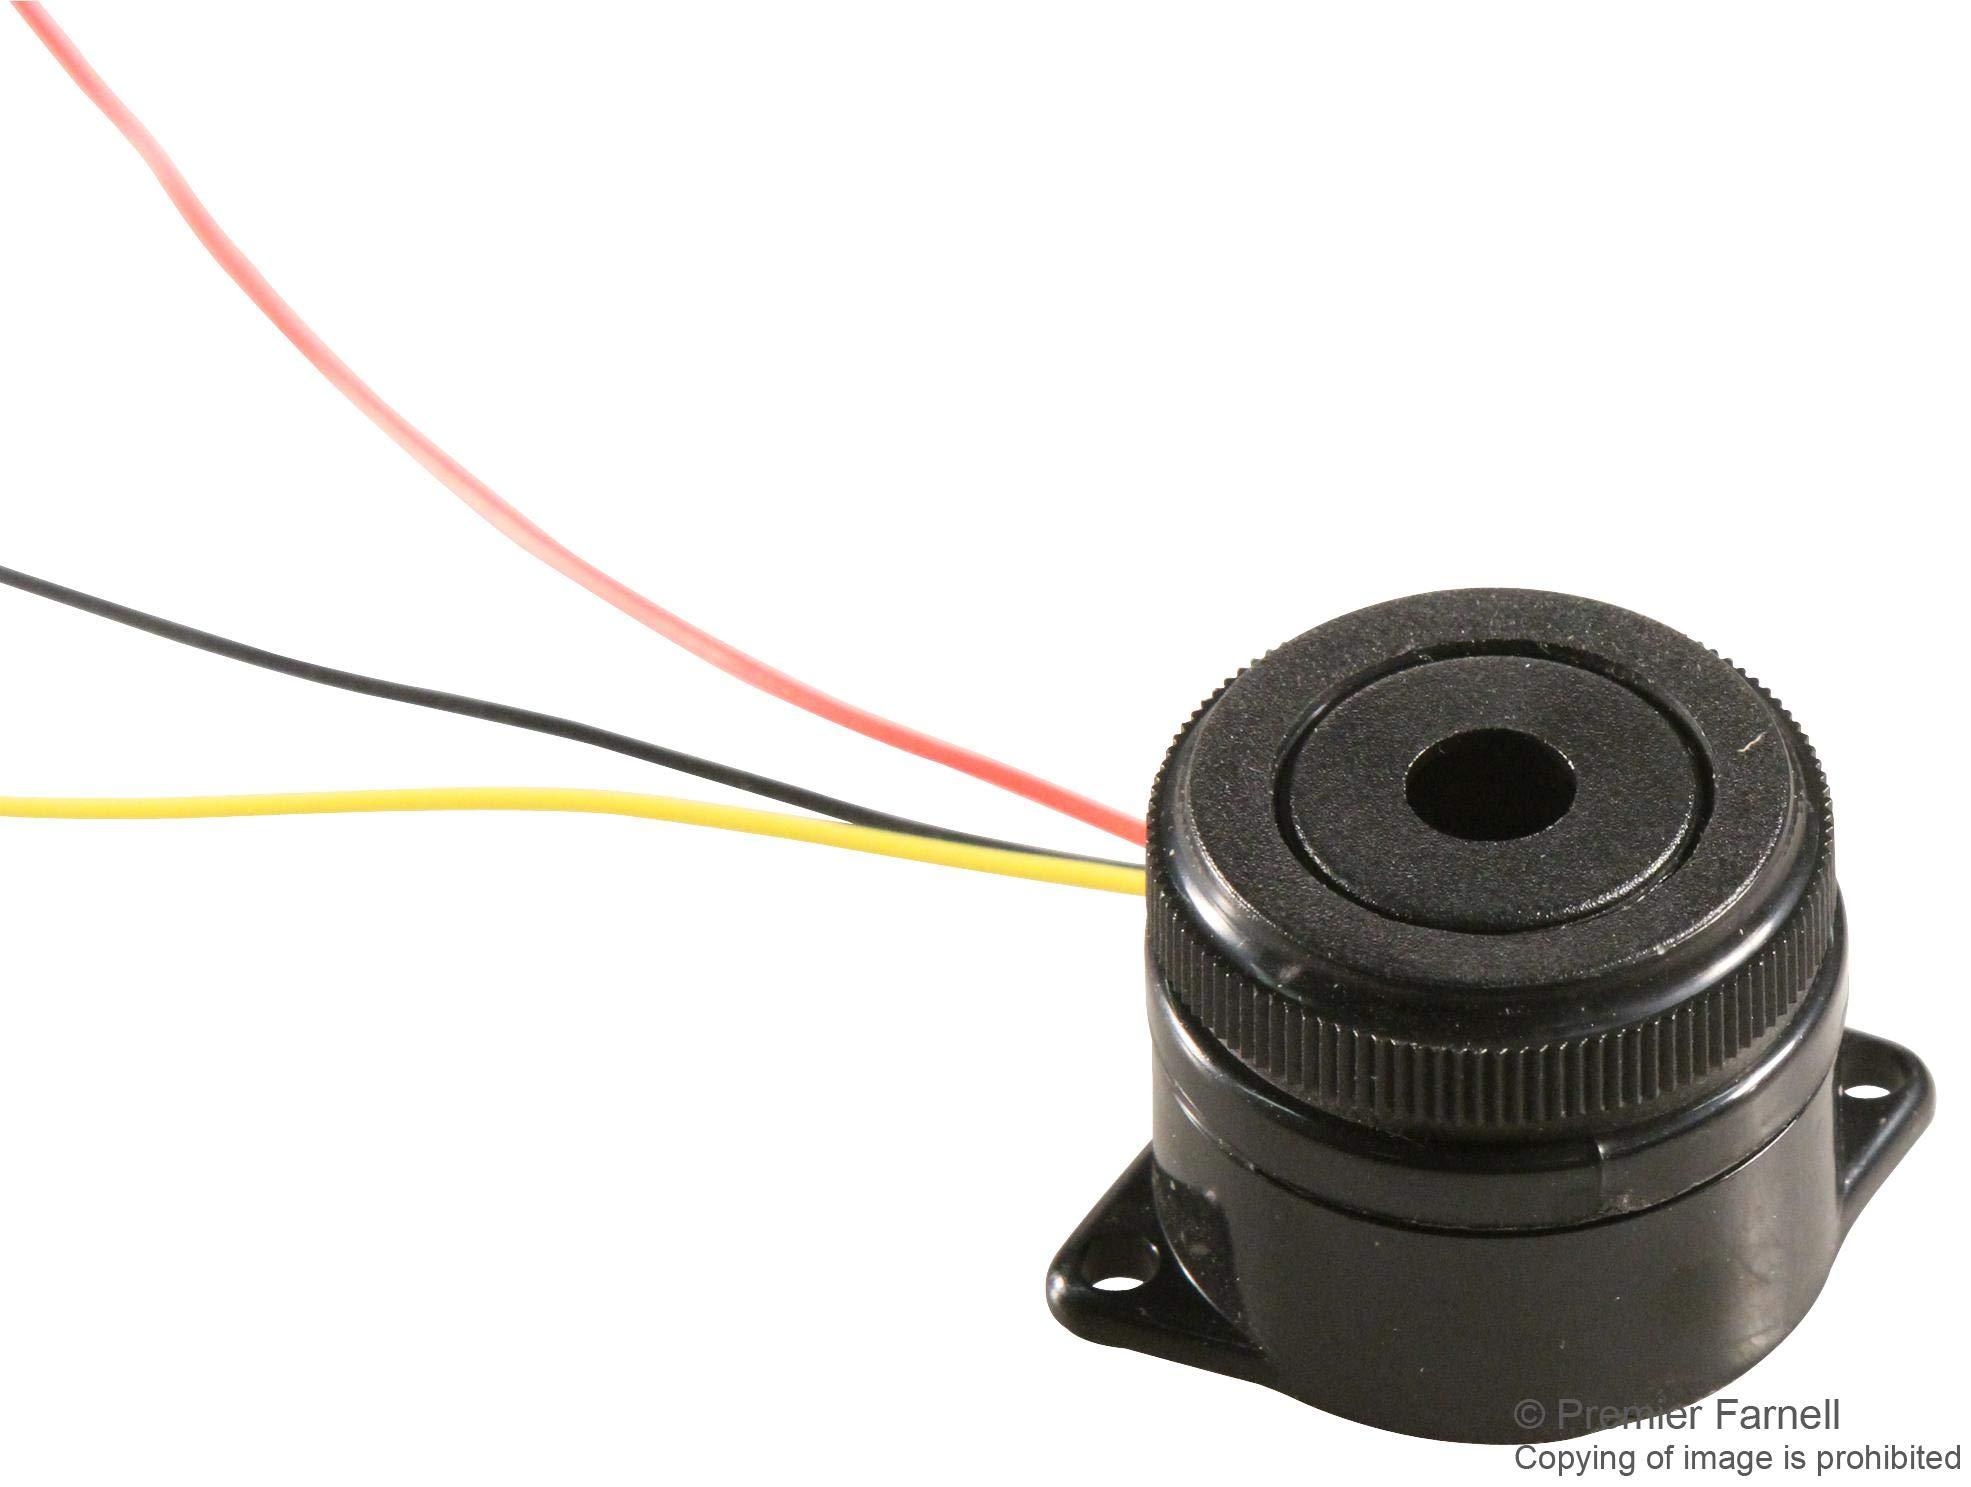 MCKPI-G2913L-3973 - Transducer, Piezo, Buzzer, Buzzer, Continuous, Slow Pulse, 3 V, 24 V, 15 mA, 90 dB (MCKPI-G2913L-3973) (Pack of 20) by MULTICOMP